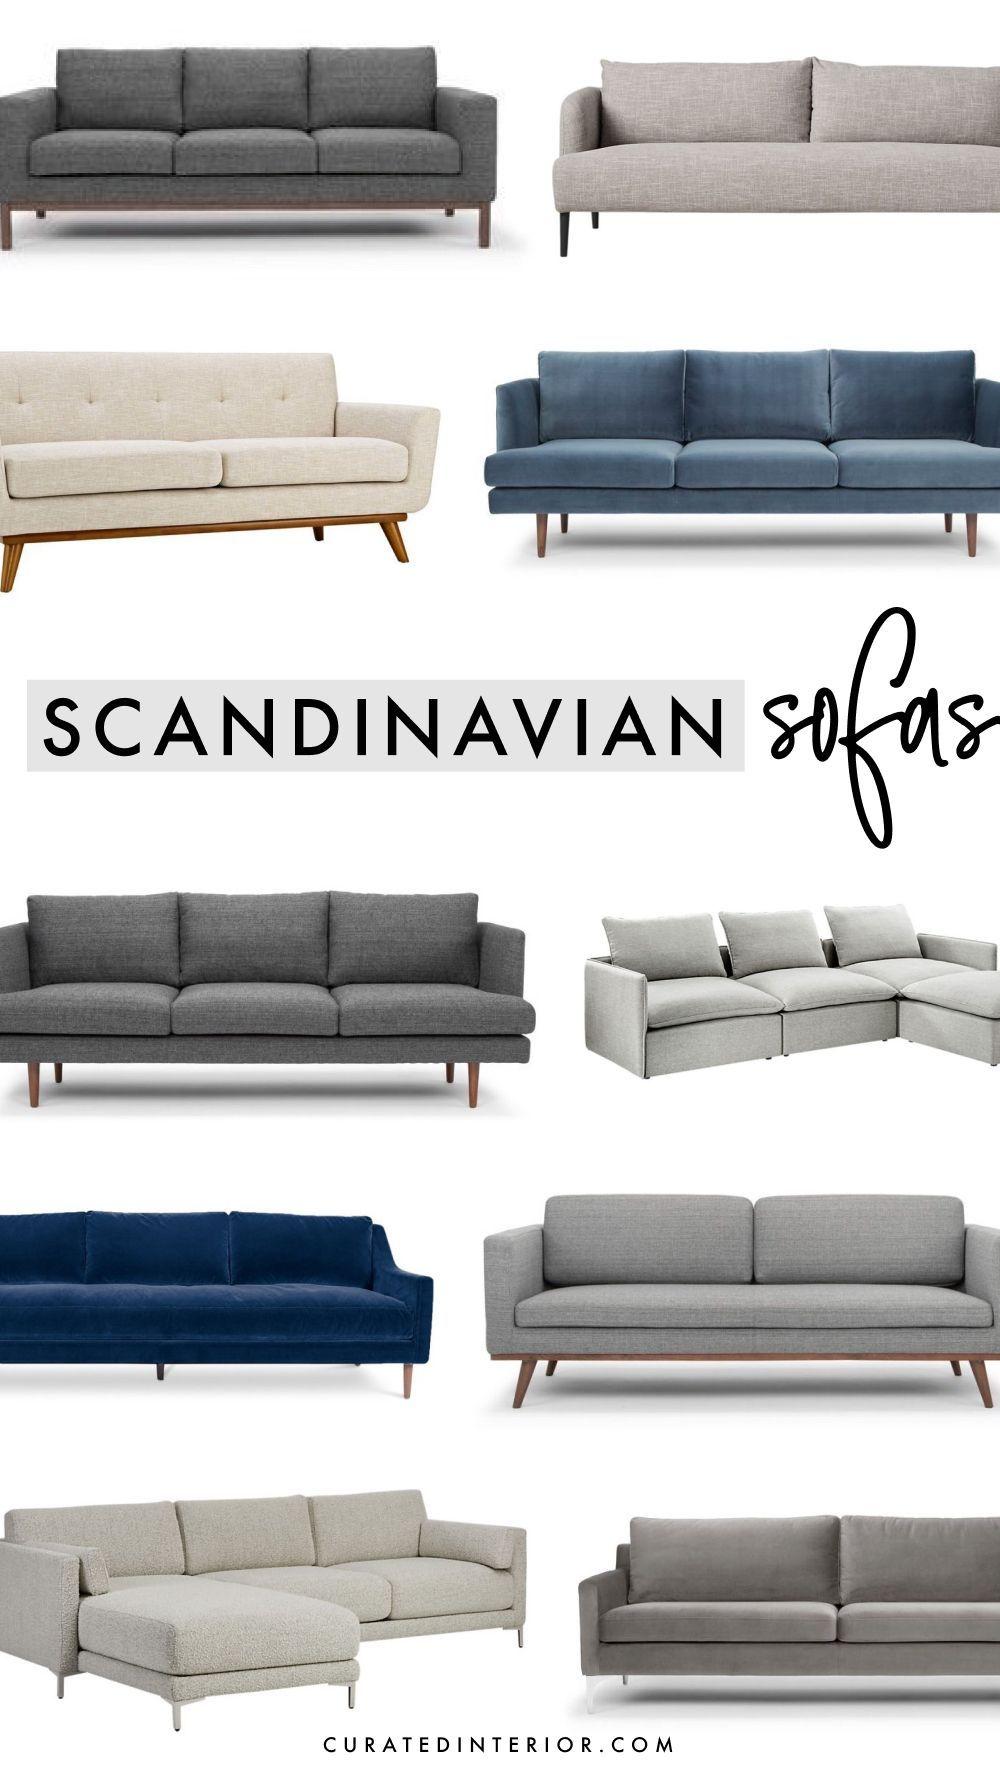 20 Minimalist Scandinavian Sofas in Gray, Beige, & Blue ...